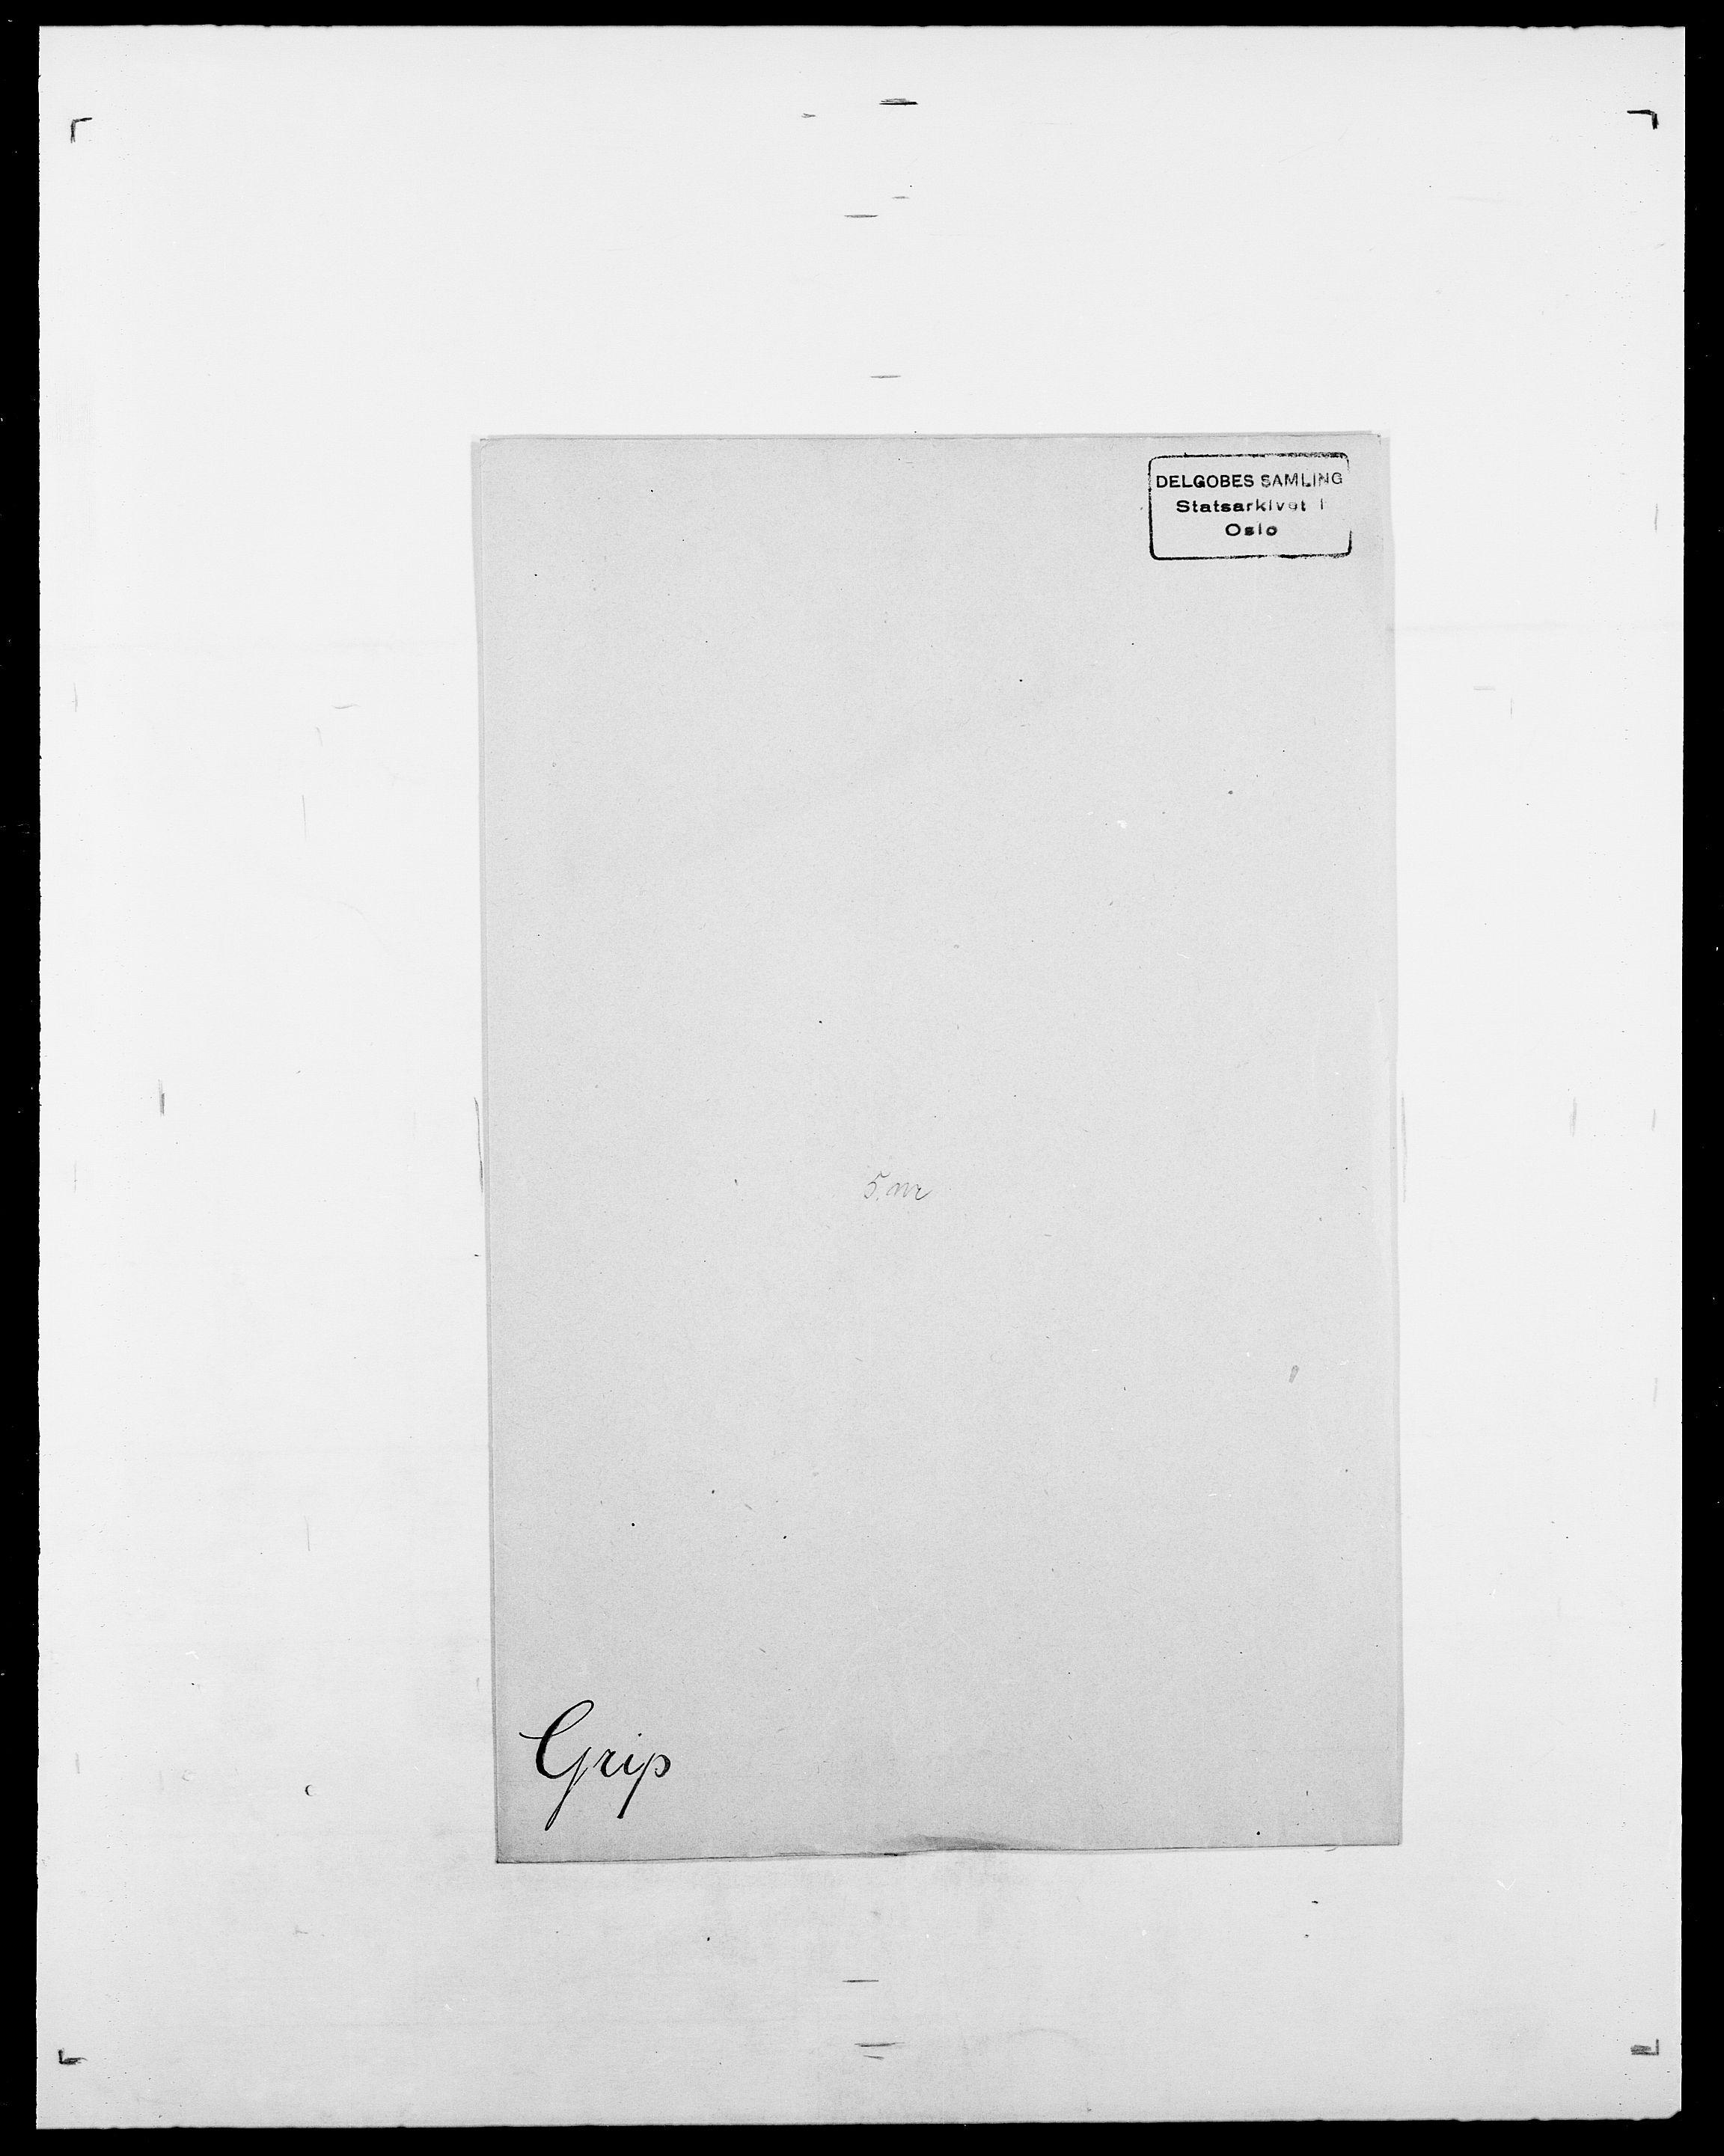 SAO, Delgobe, Charles Antoine - samling, D/Da/L0014: Giebdhausen - Grip, s. 699